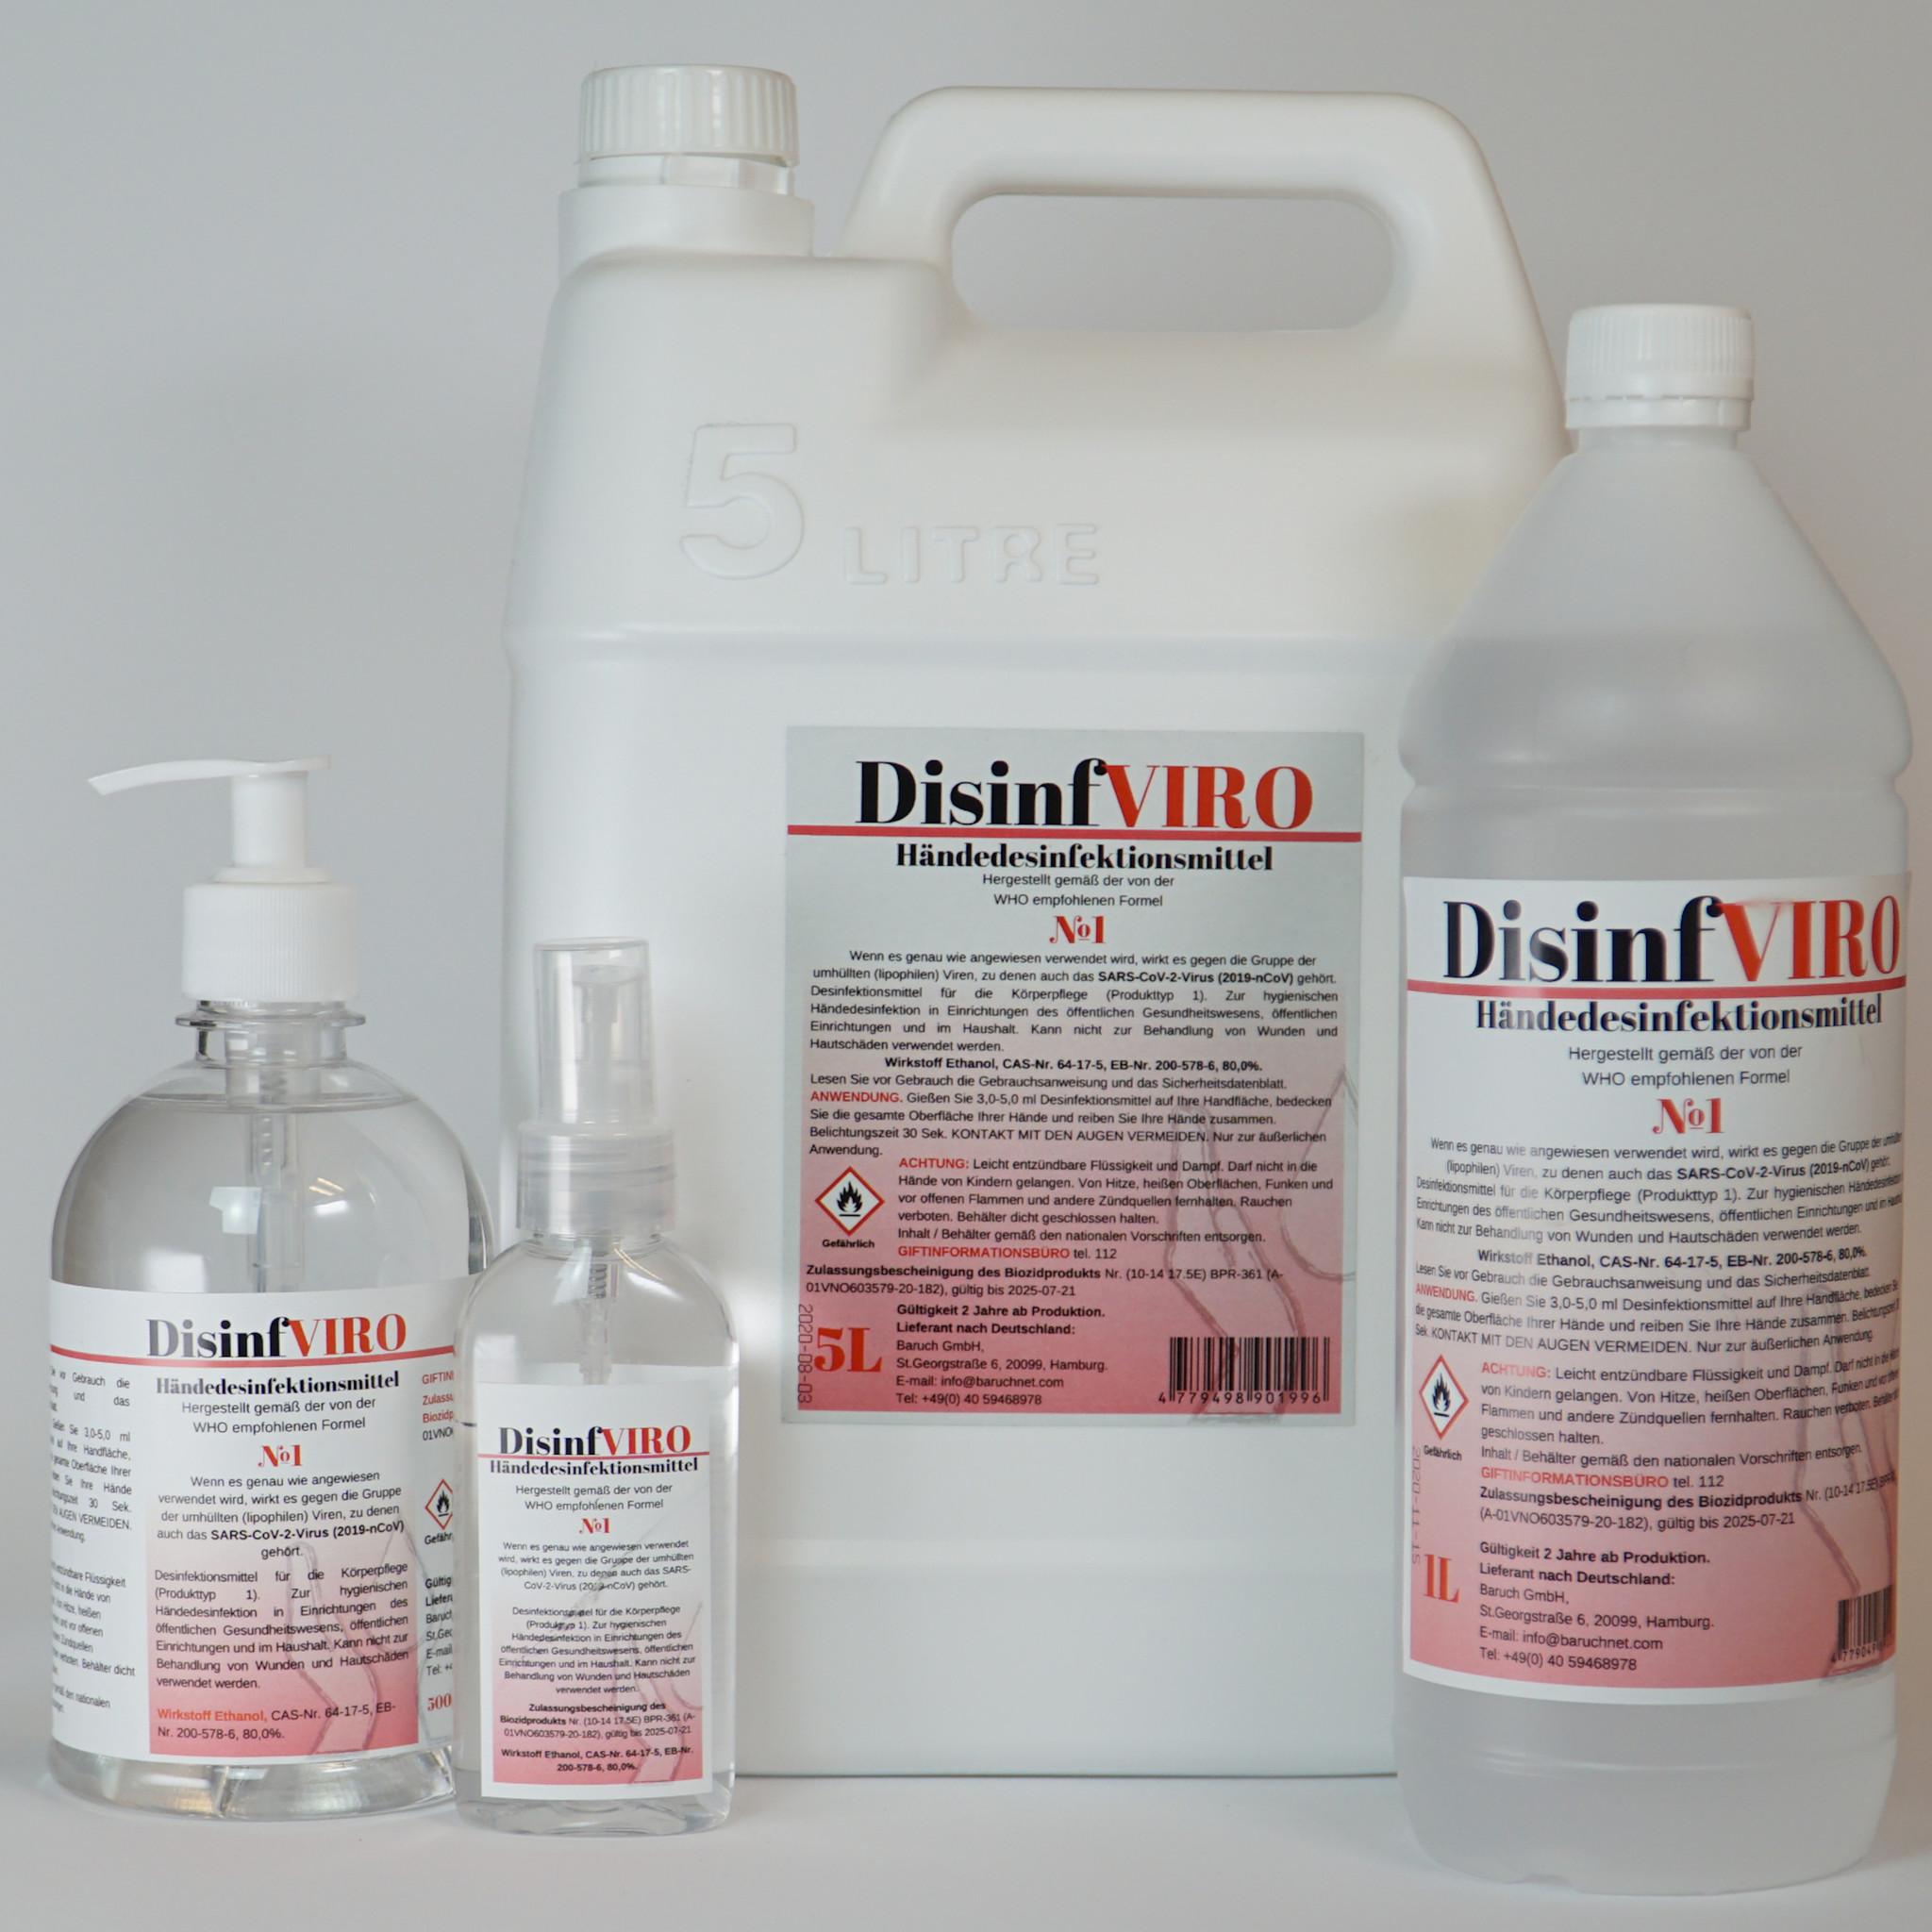 DisinfVIRO Händedesinfektionsmittel